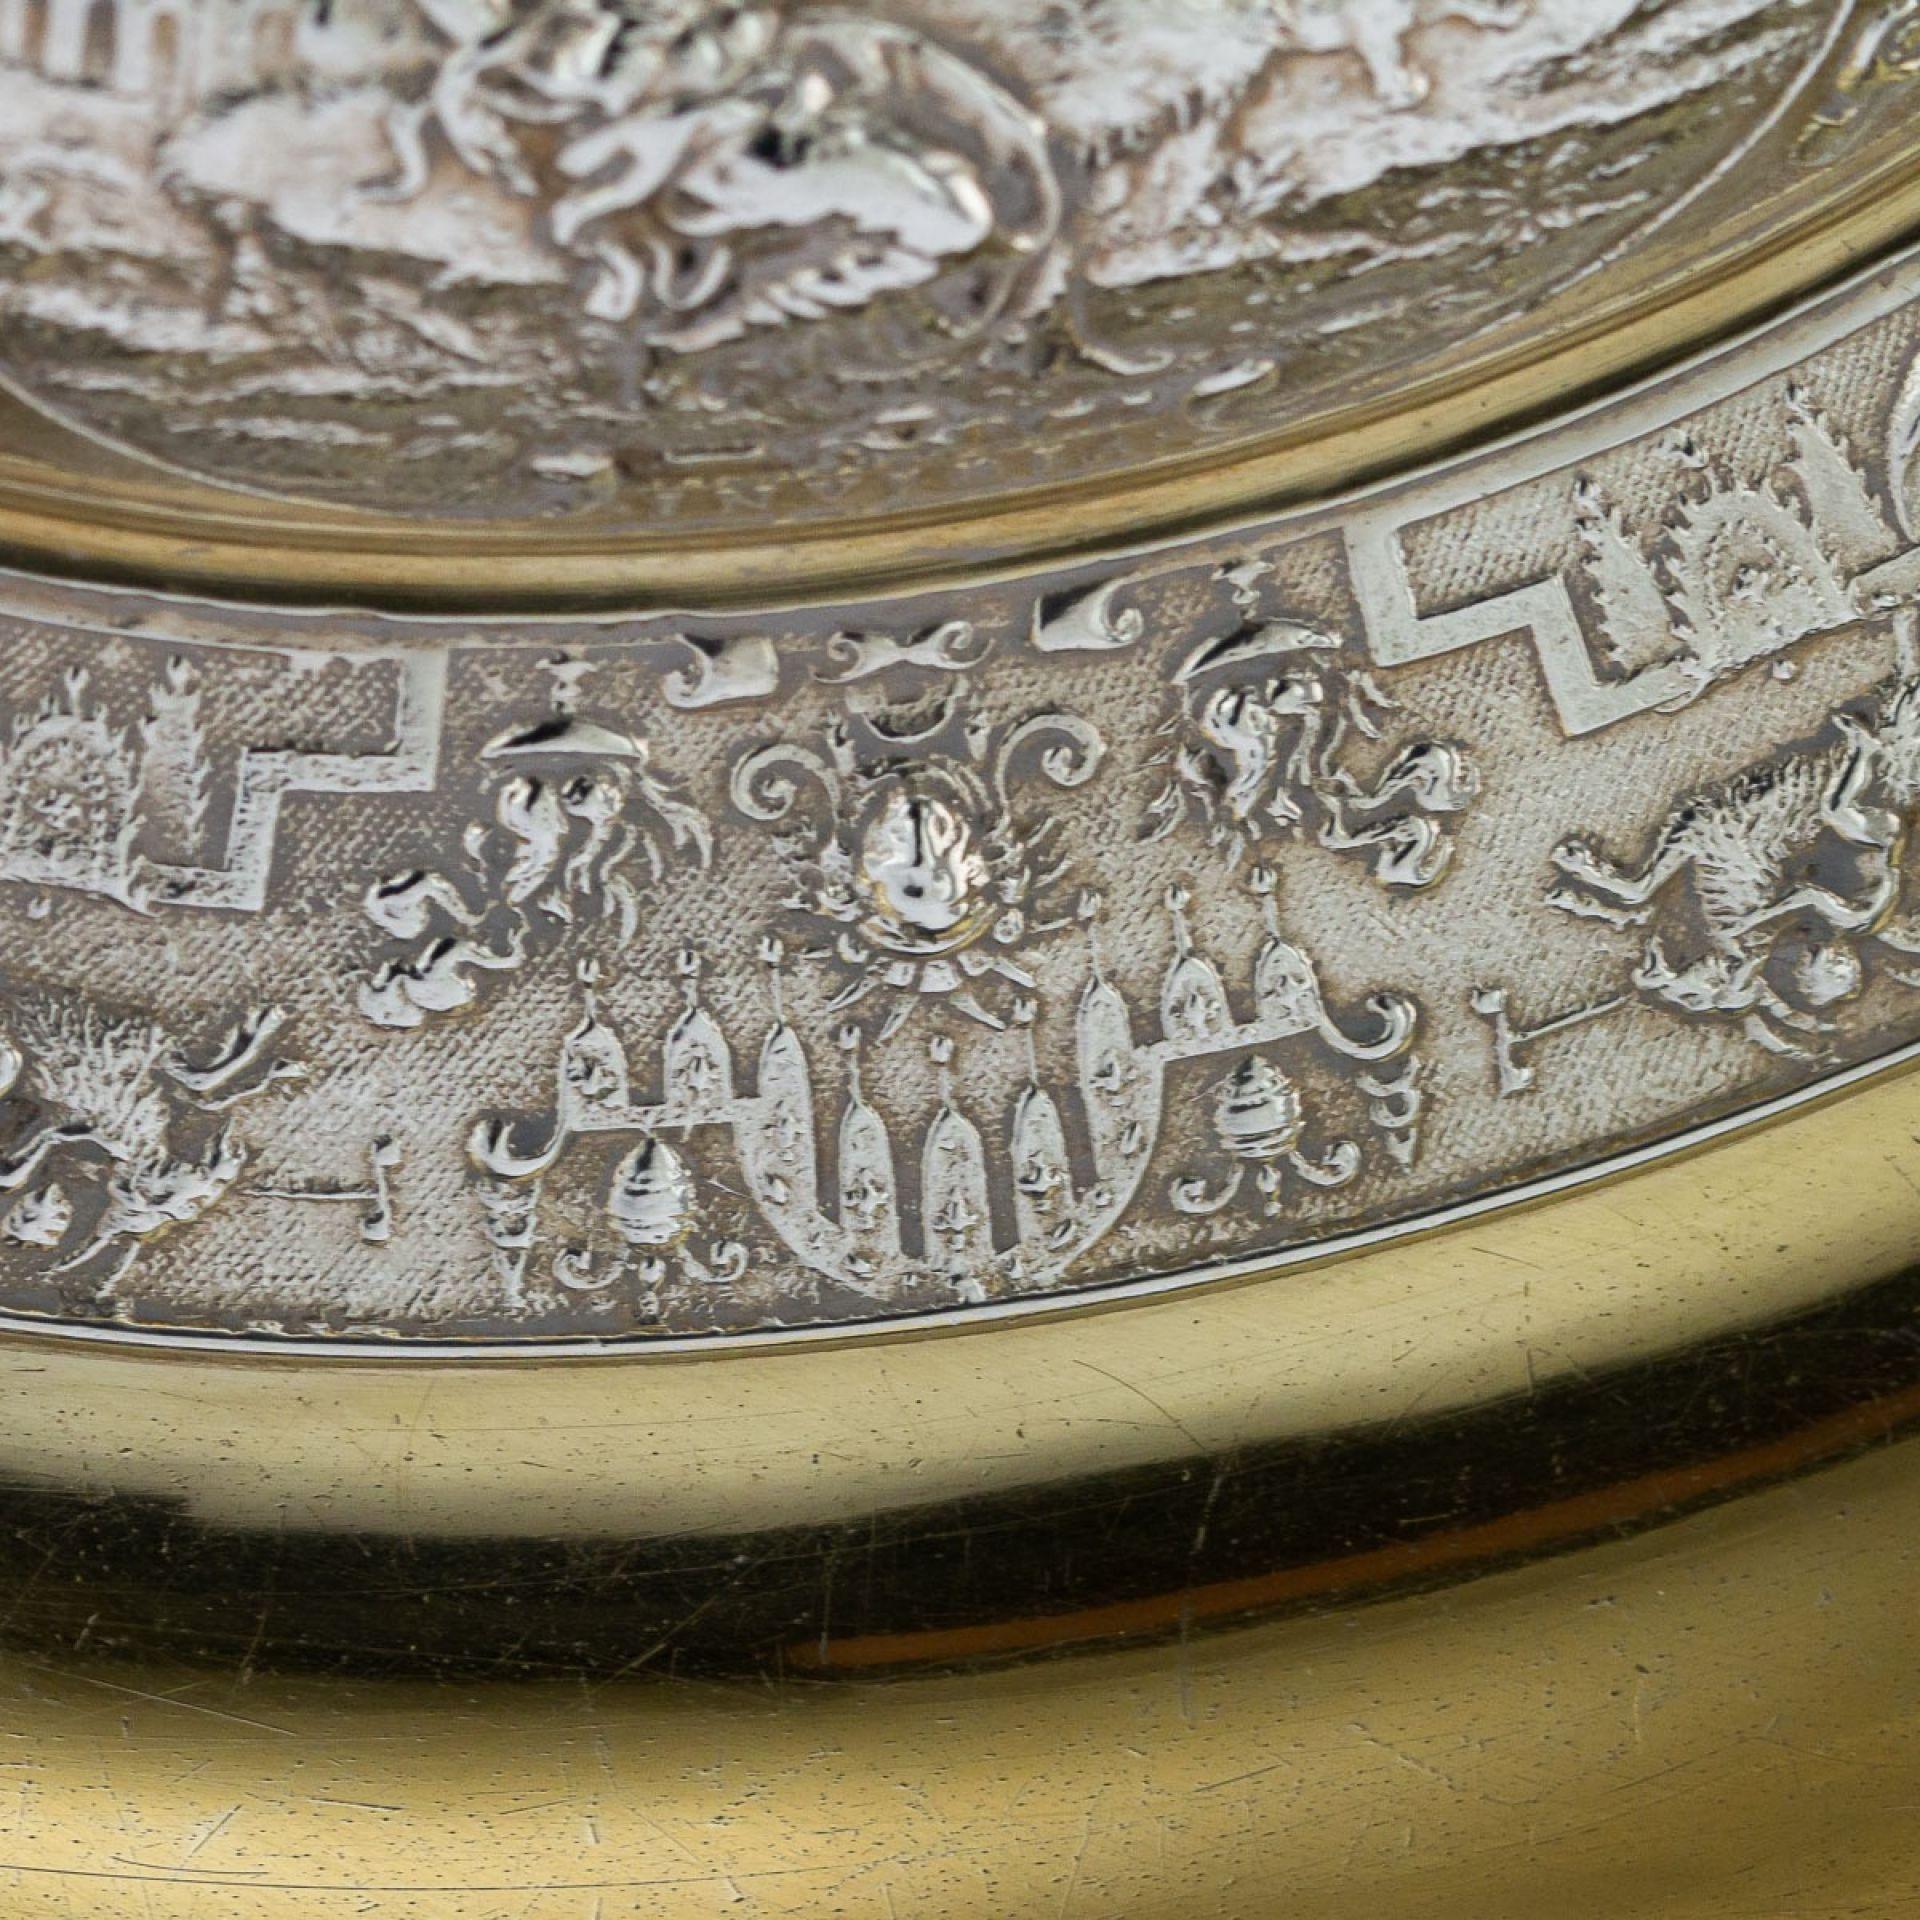 ANTIQUE 19thC VICTORIAN SOLID SILVER SIDEBOARD DISH, ELKINGTON c.1874